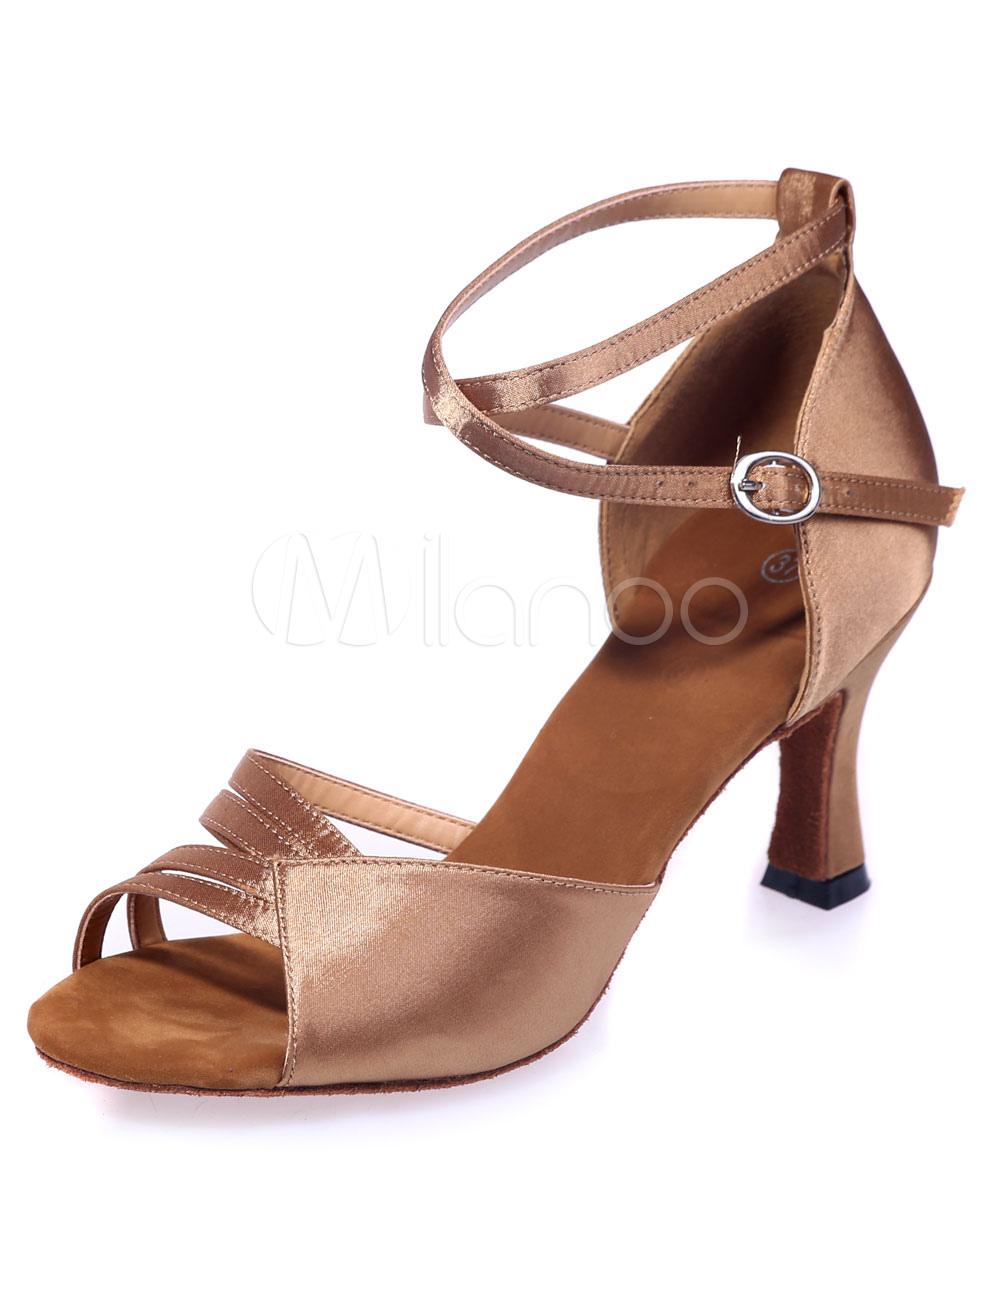 Gold Latin Dance Sandals Cut-Out Satin Heels for Women